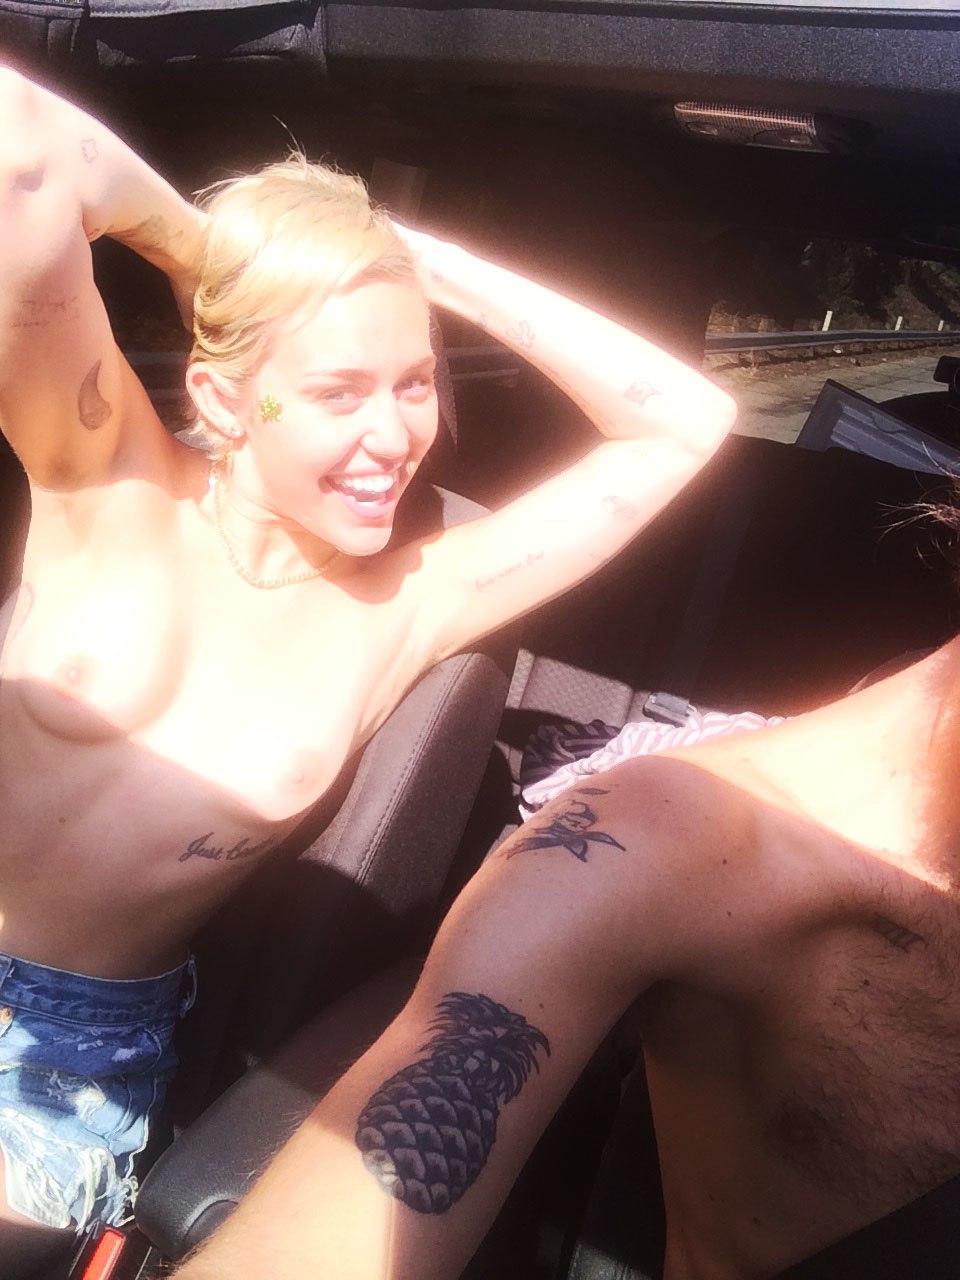 Miley cyrus nude leak